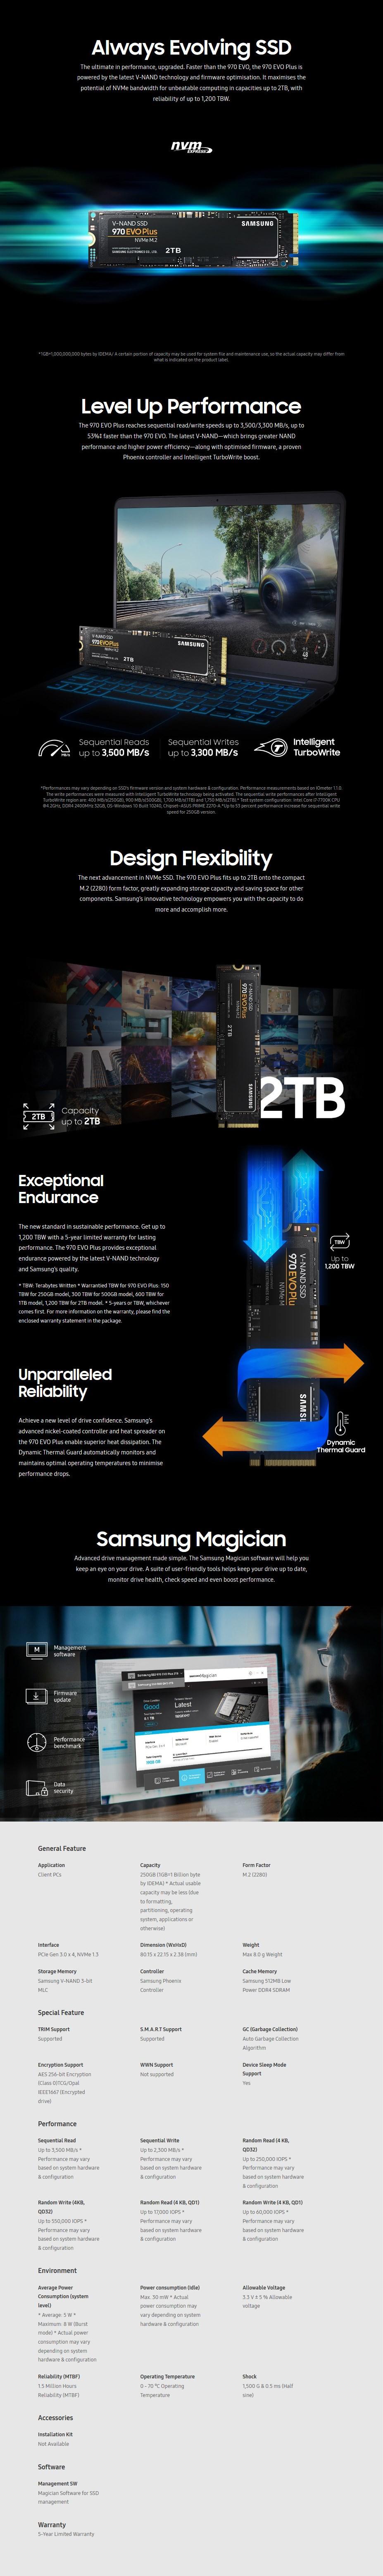 Samsung 970 EVO Plus 250GB NVMe 1.3 M.2 (2280) 3-Bit V-NAND SSD - MZ-V7S250BW - Desktop Overview 2